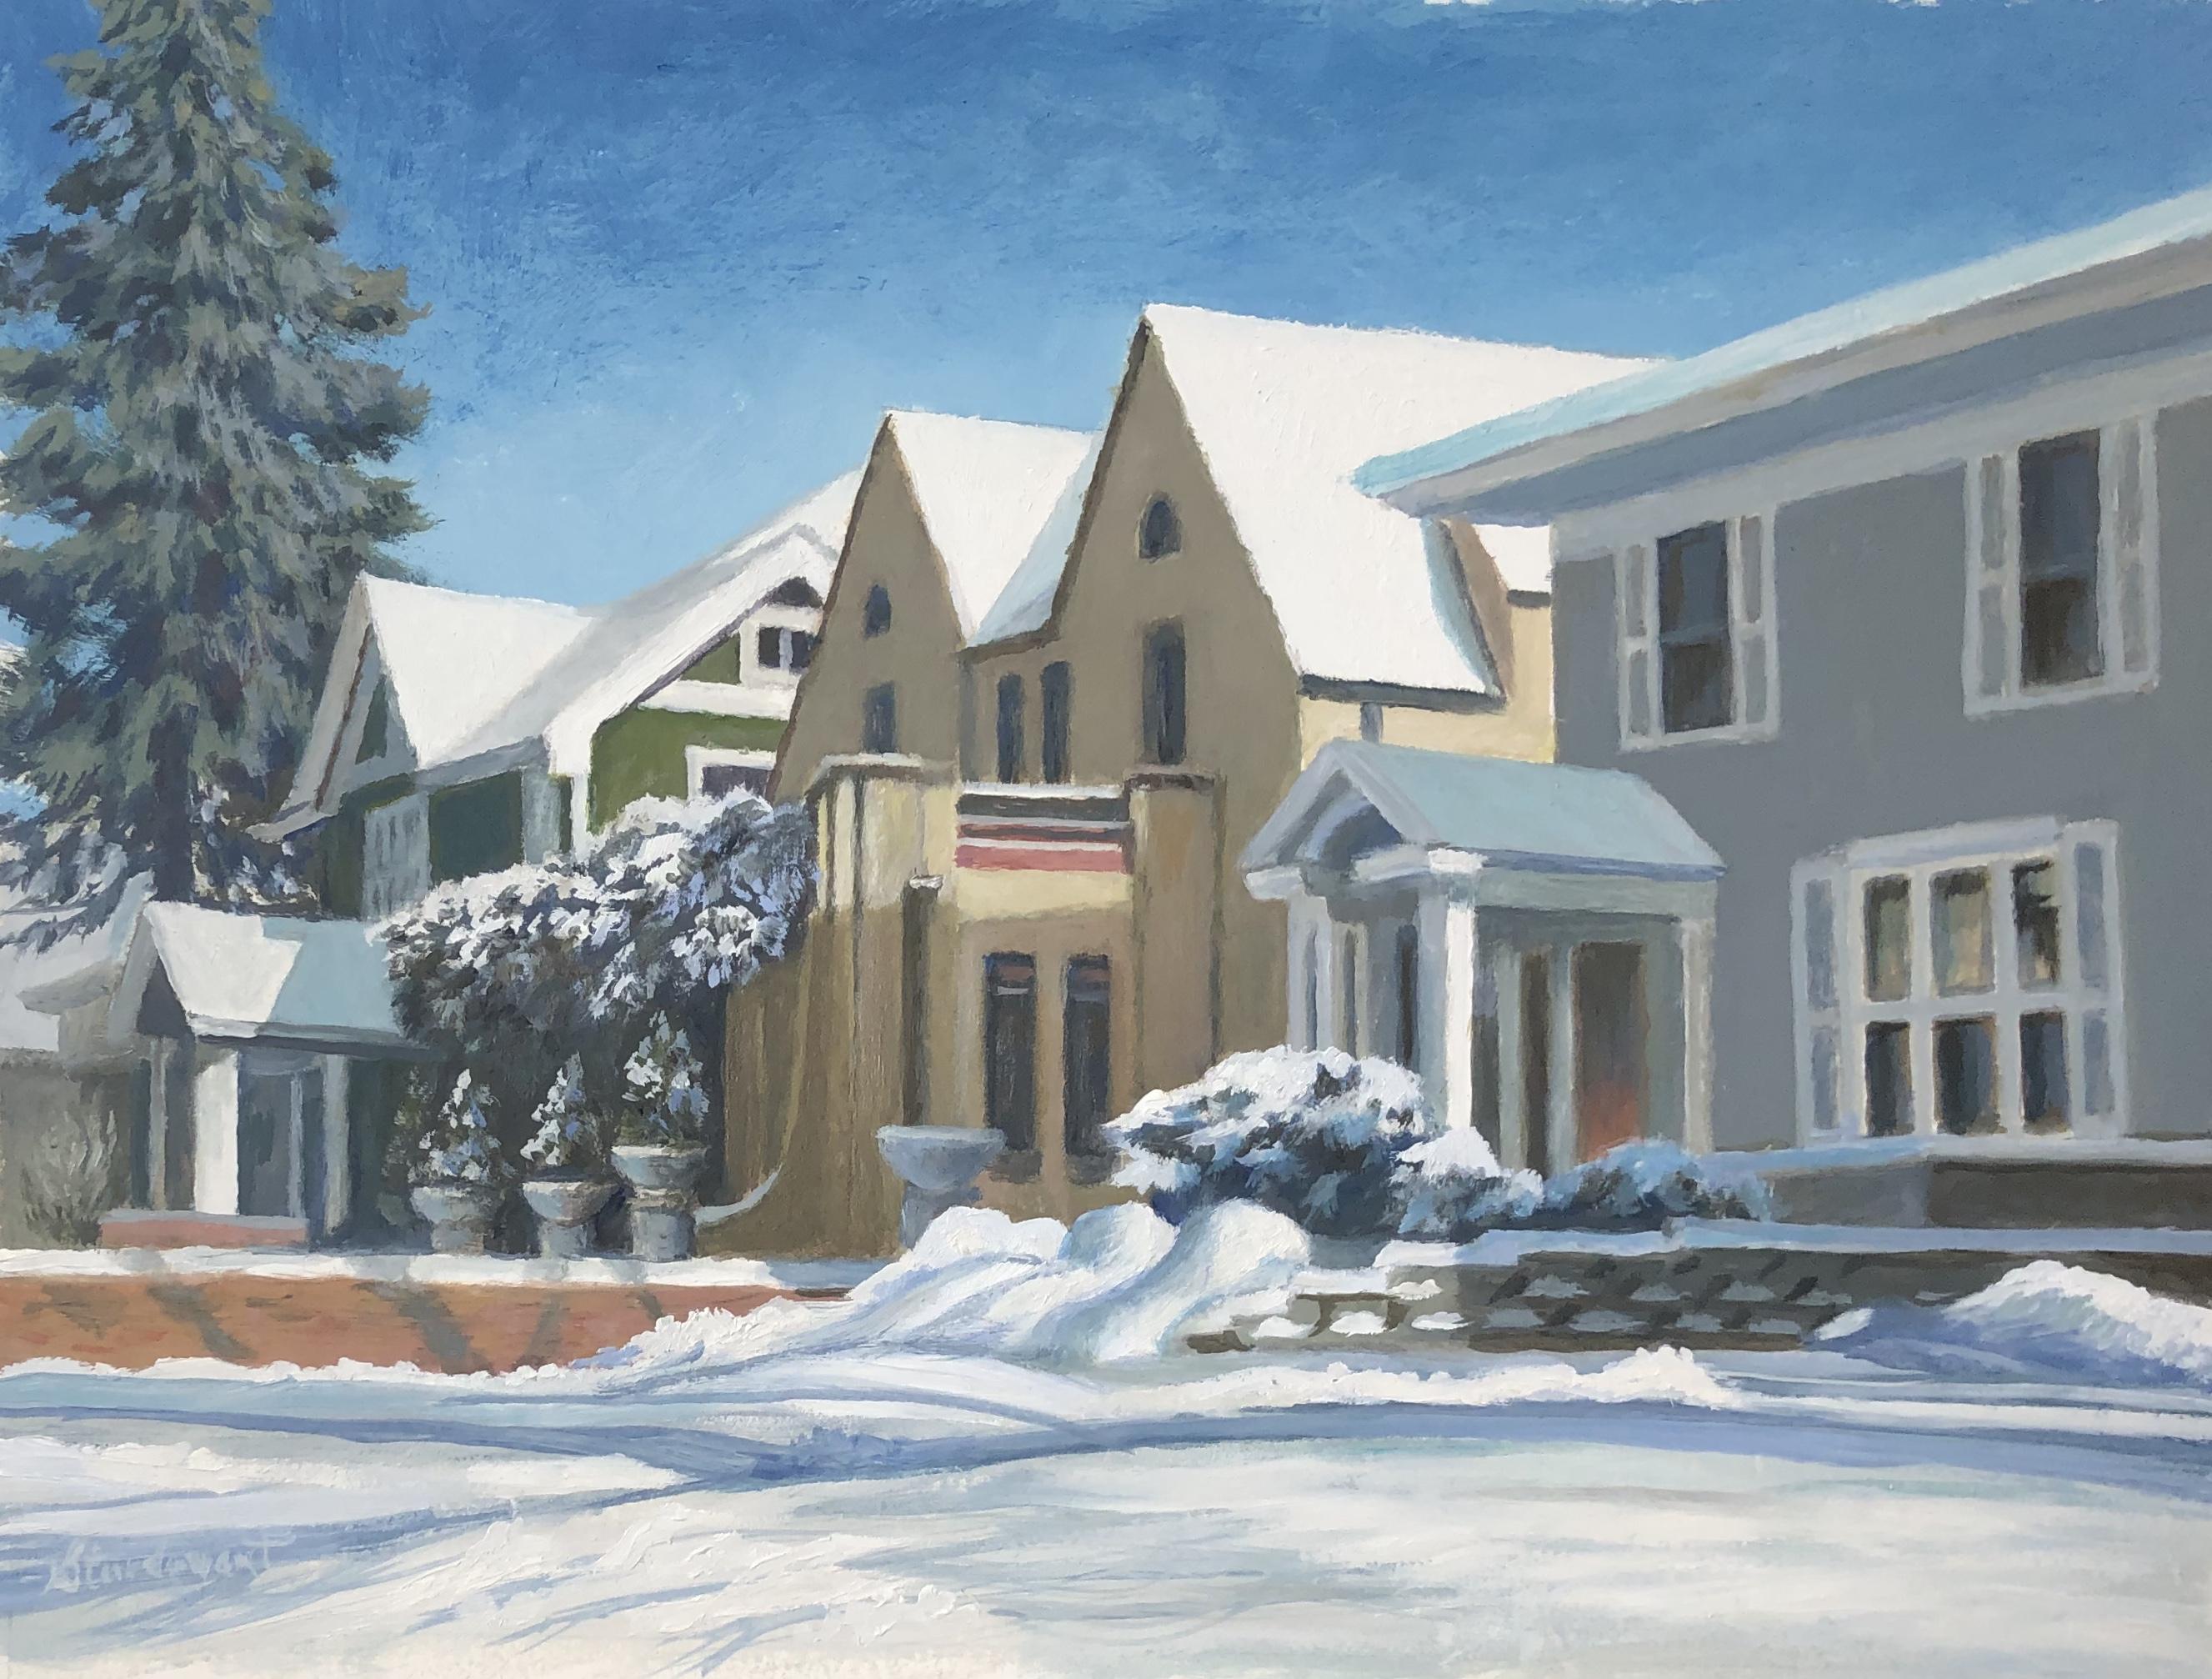 Neighborhood series 4